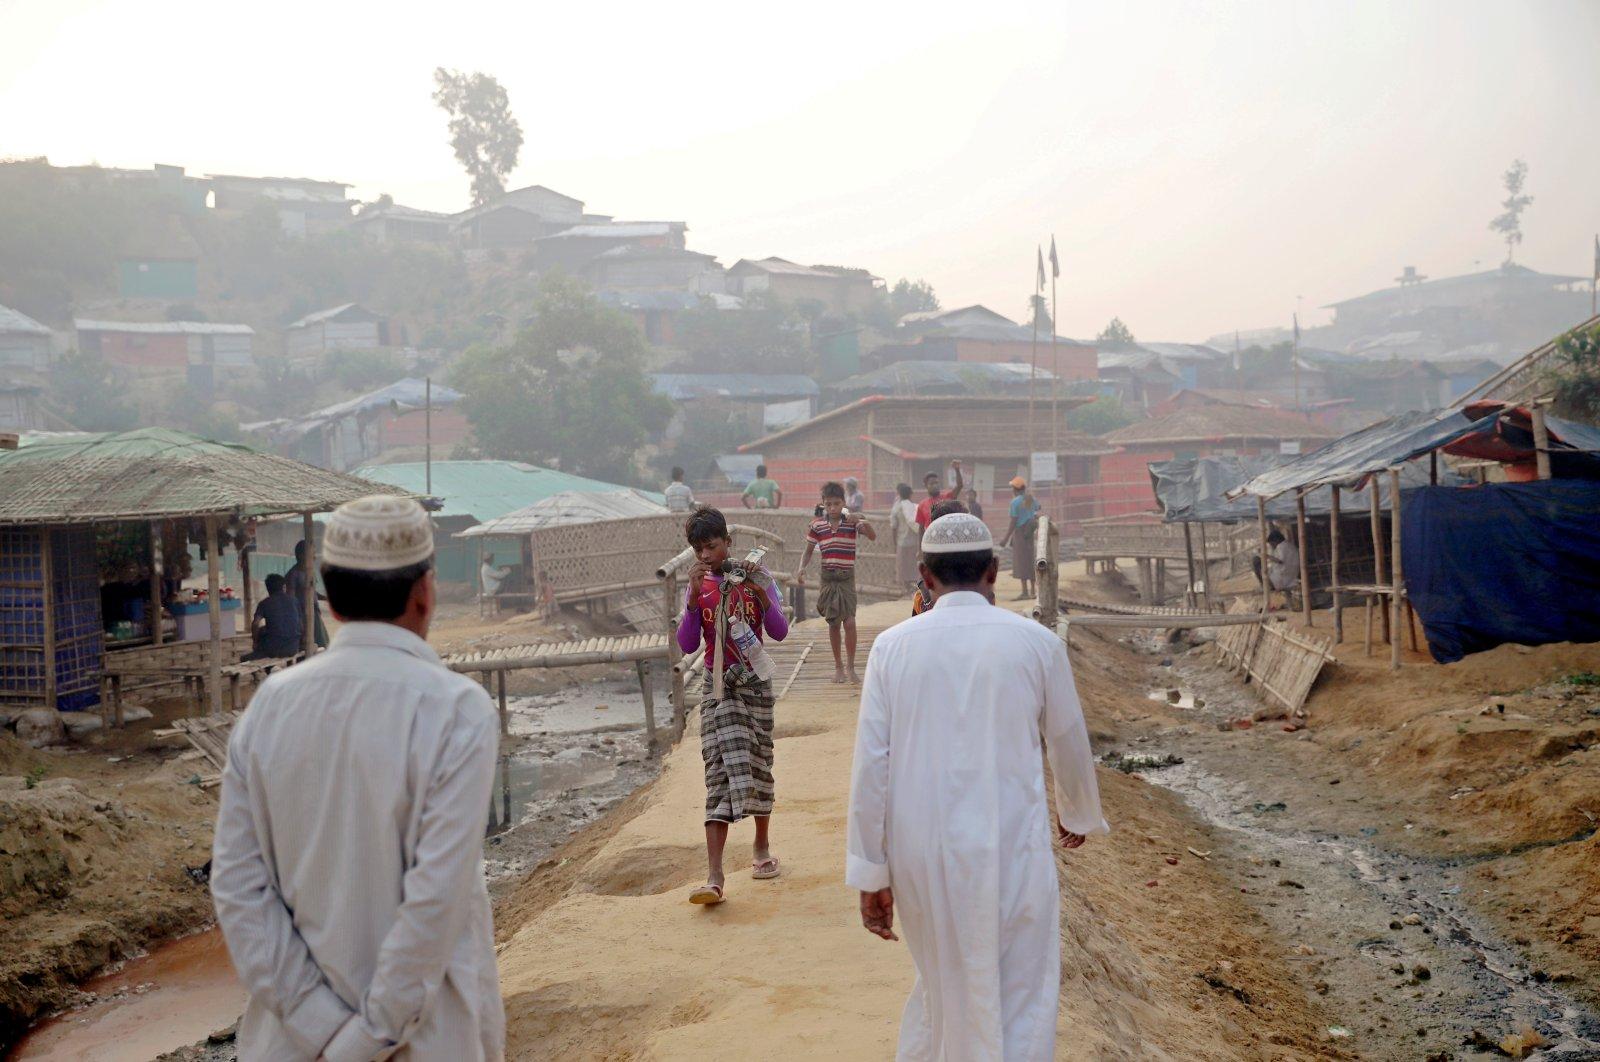 Rohingya refugees walk on a road at the Balukhali camp in Cox's Bazar, Bangladesh, April 8, 2019. (Reuters Photo)